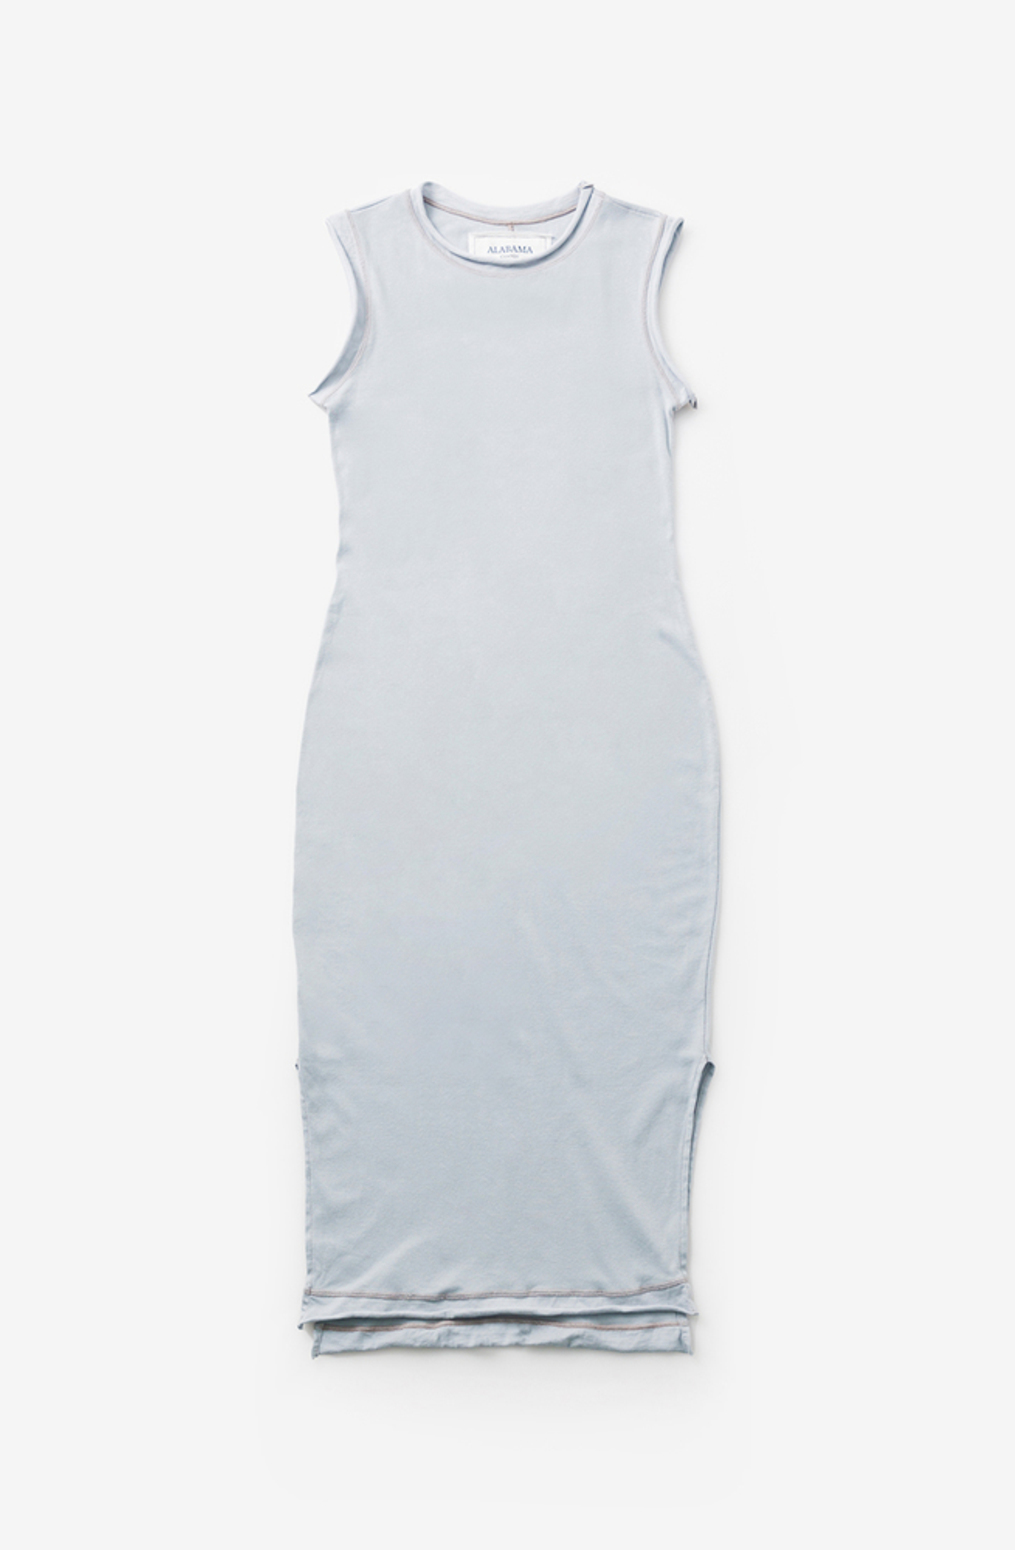 Alabama chanin womens dress cotton crew neck 4